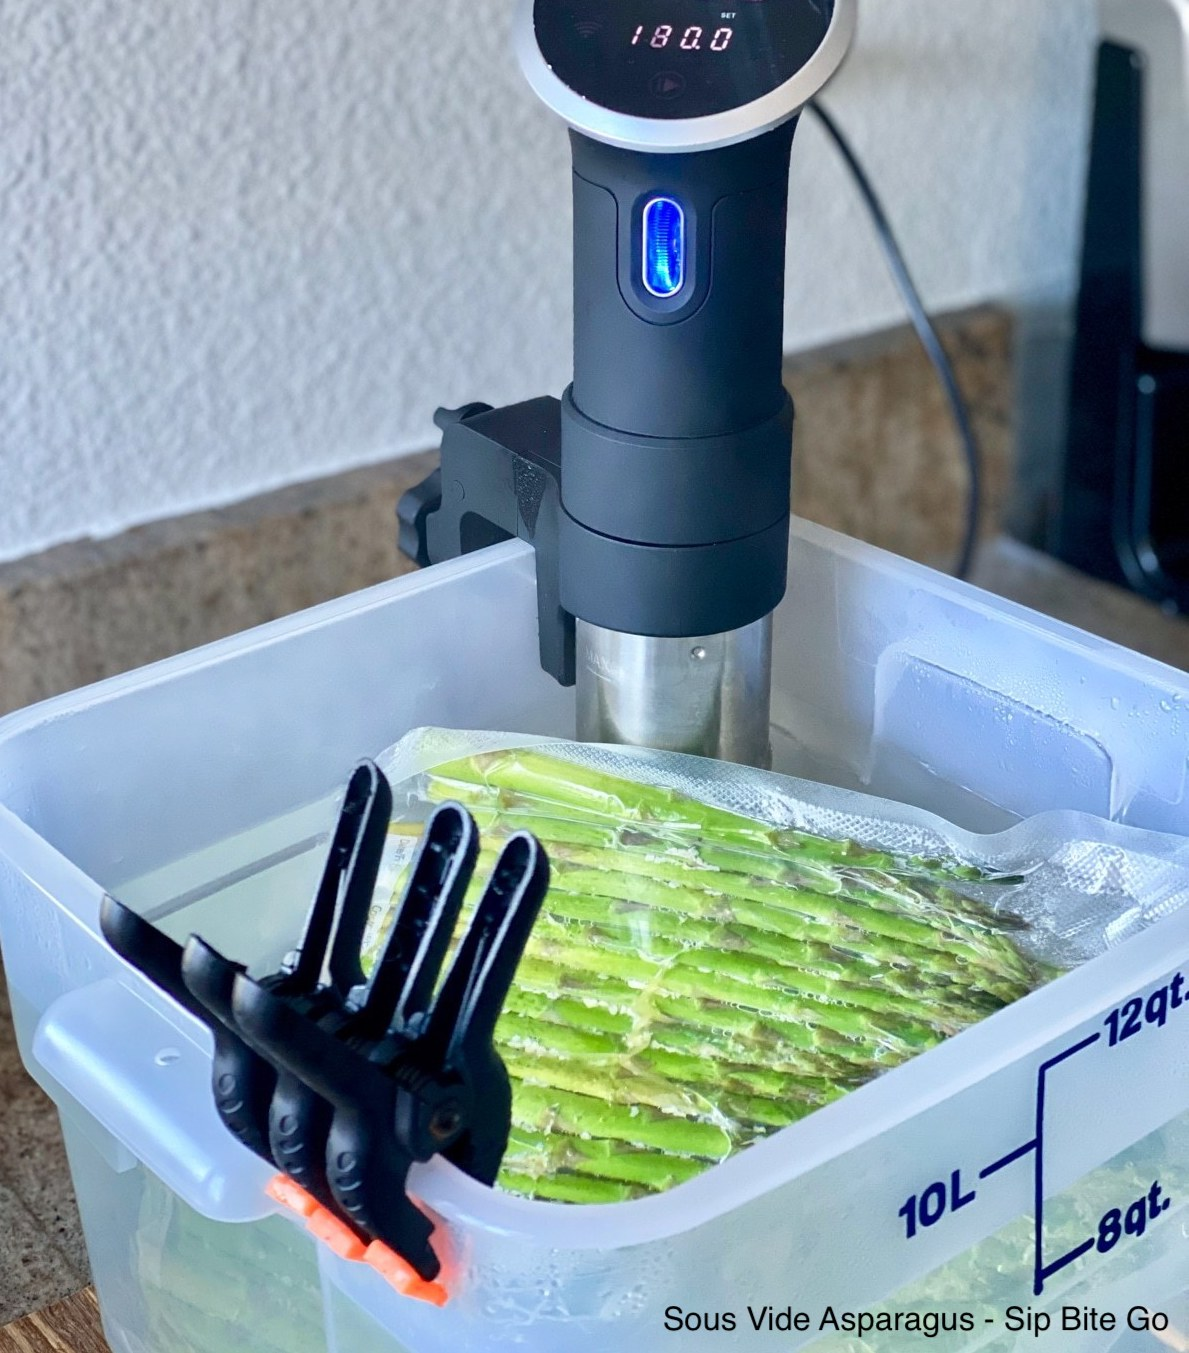 sous vide asparagus from sip bite go